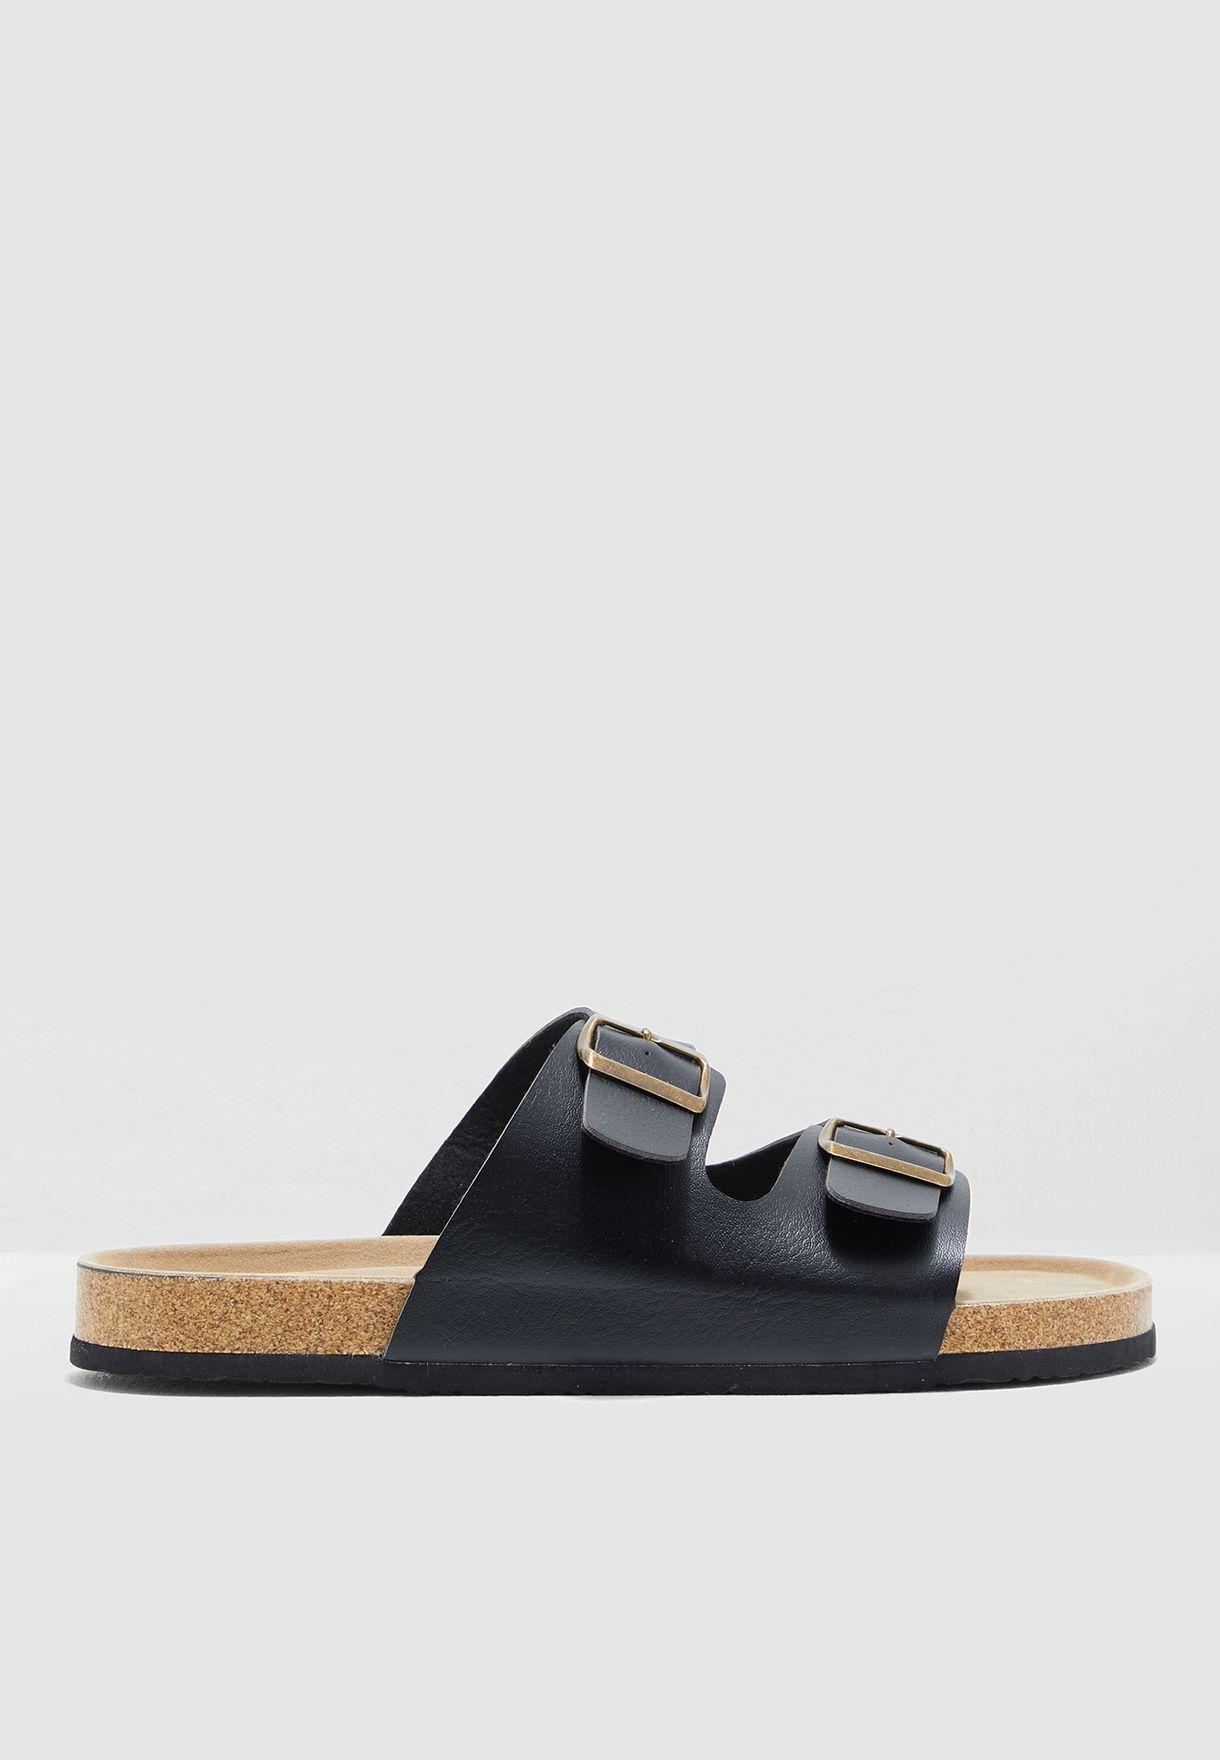 4de595d2c9cd0 Shop Robert wood black Two Strap Sandals YD201 for Men in Kuwait ...